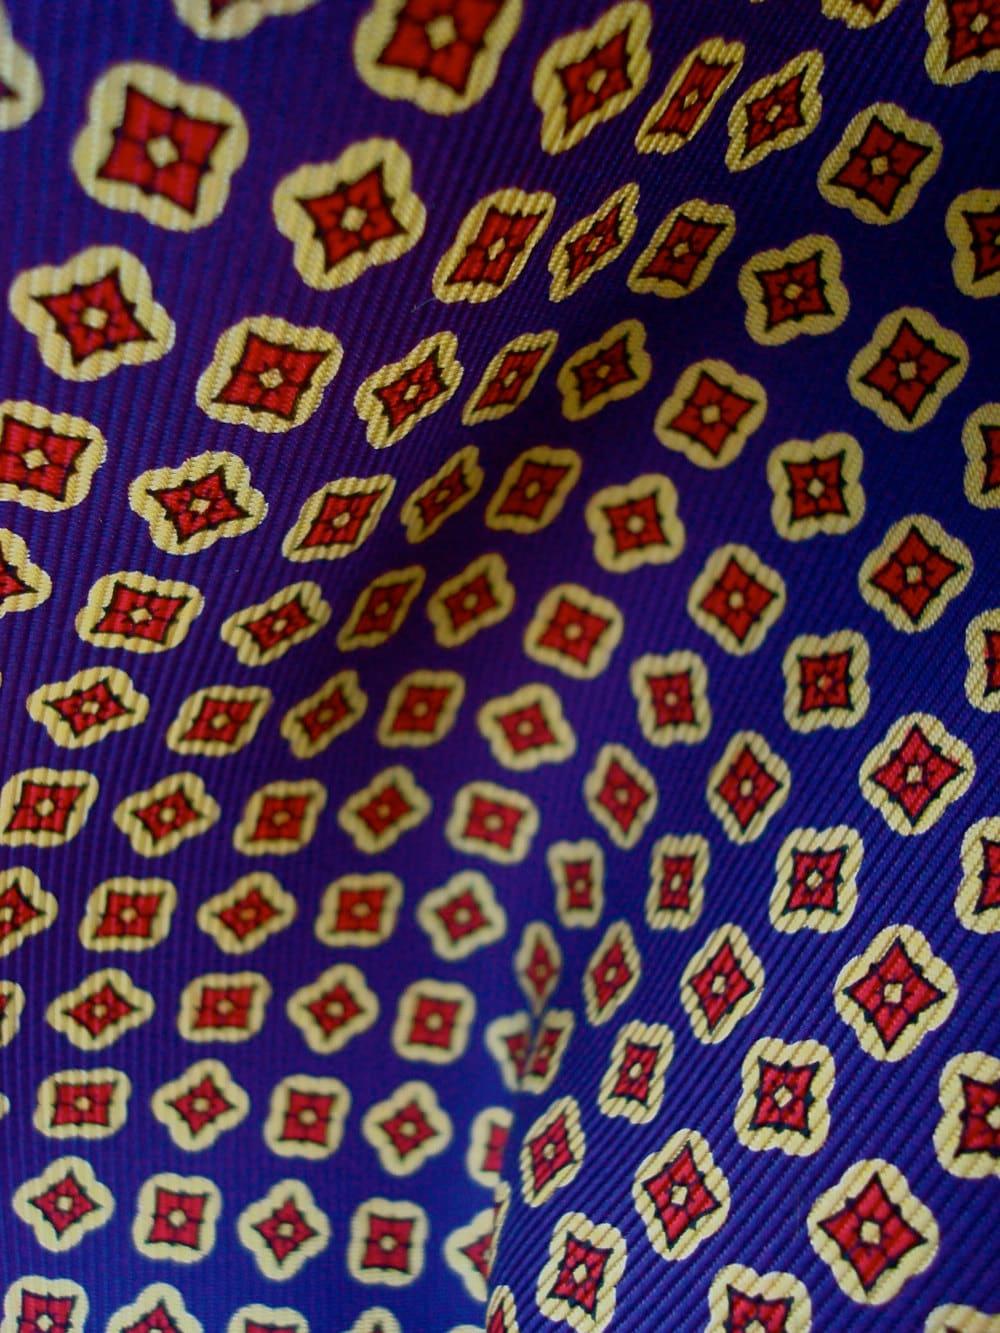 Printed Tie Silk Fabric A by WideEyedGirls on Etsy